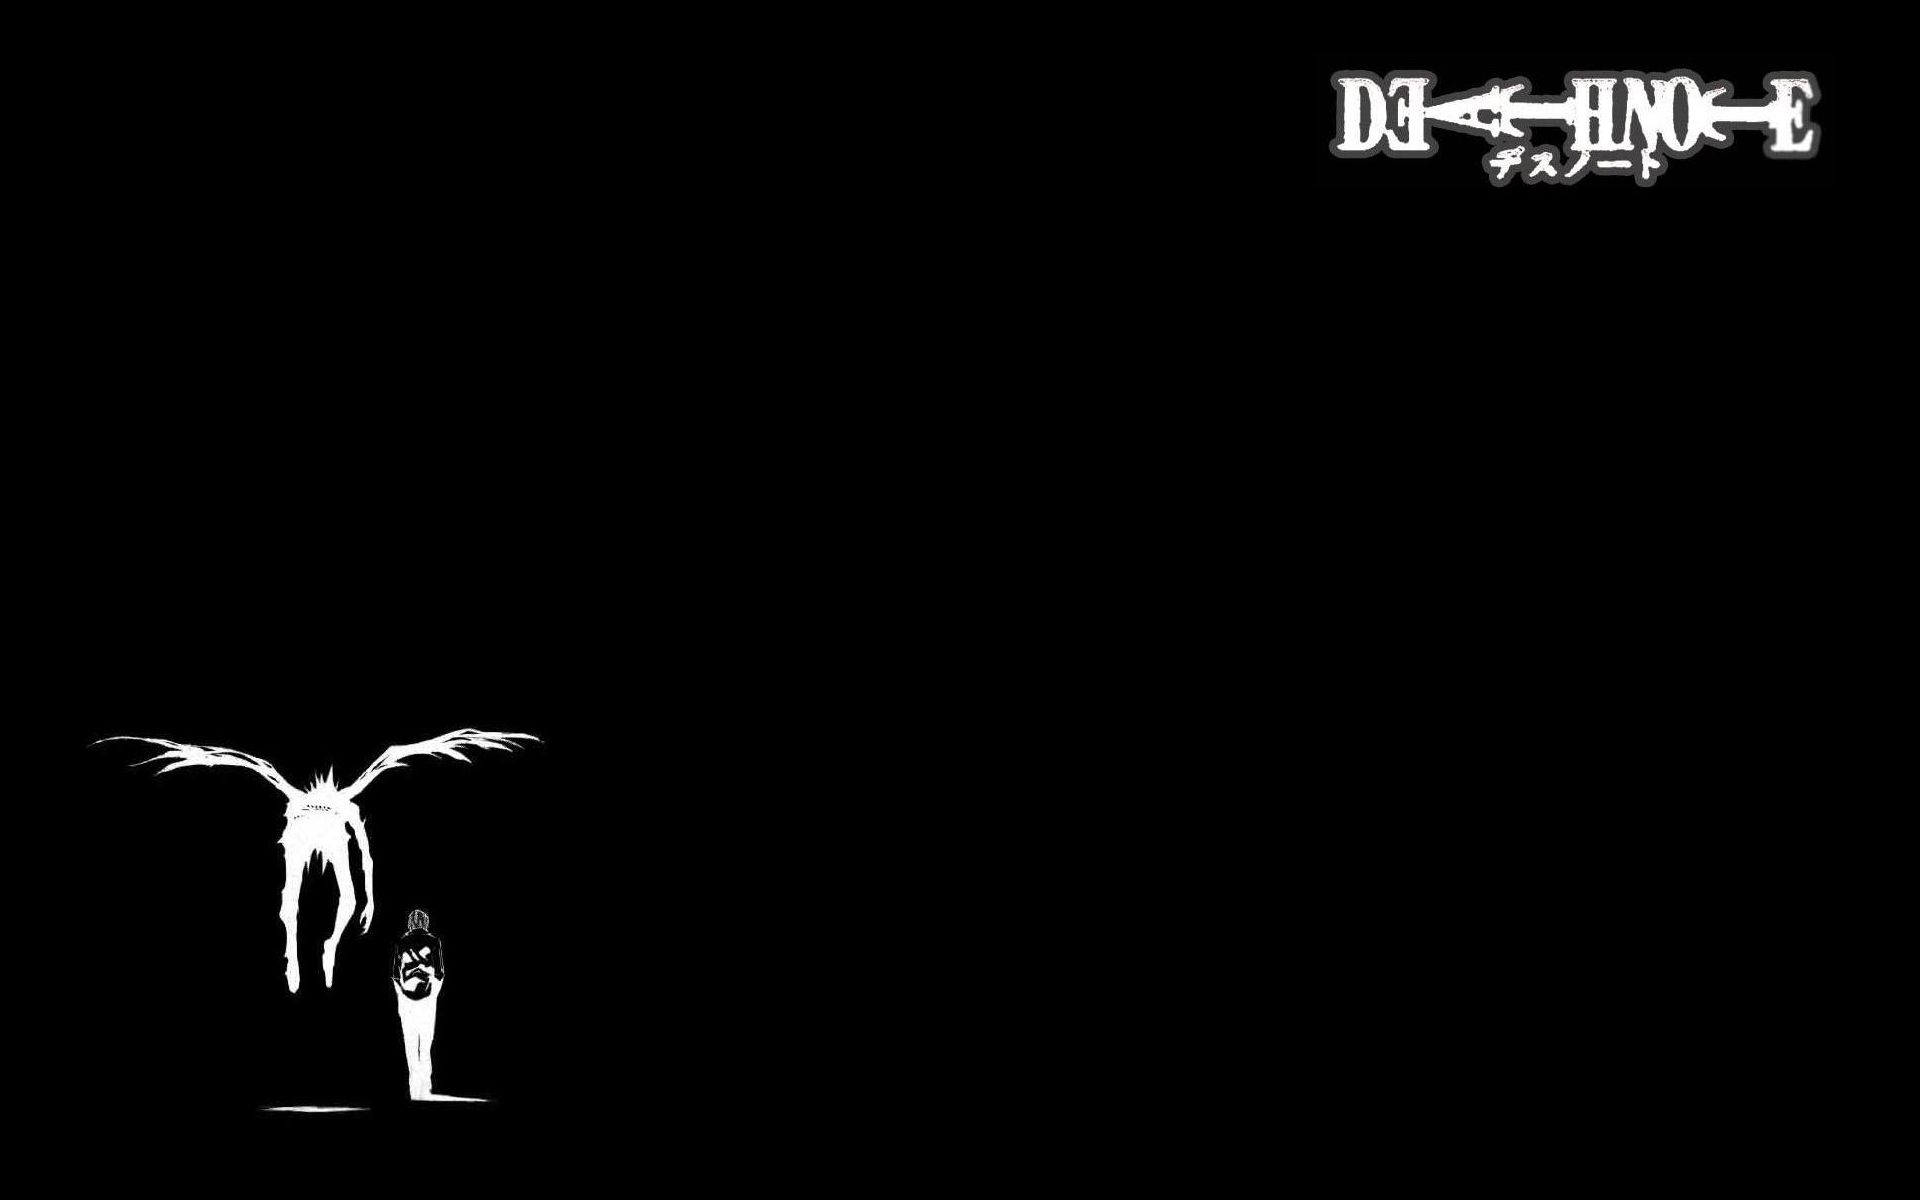 Netflix divulga novo trailer de Death Note